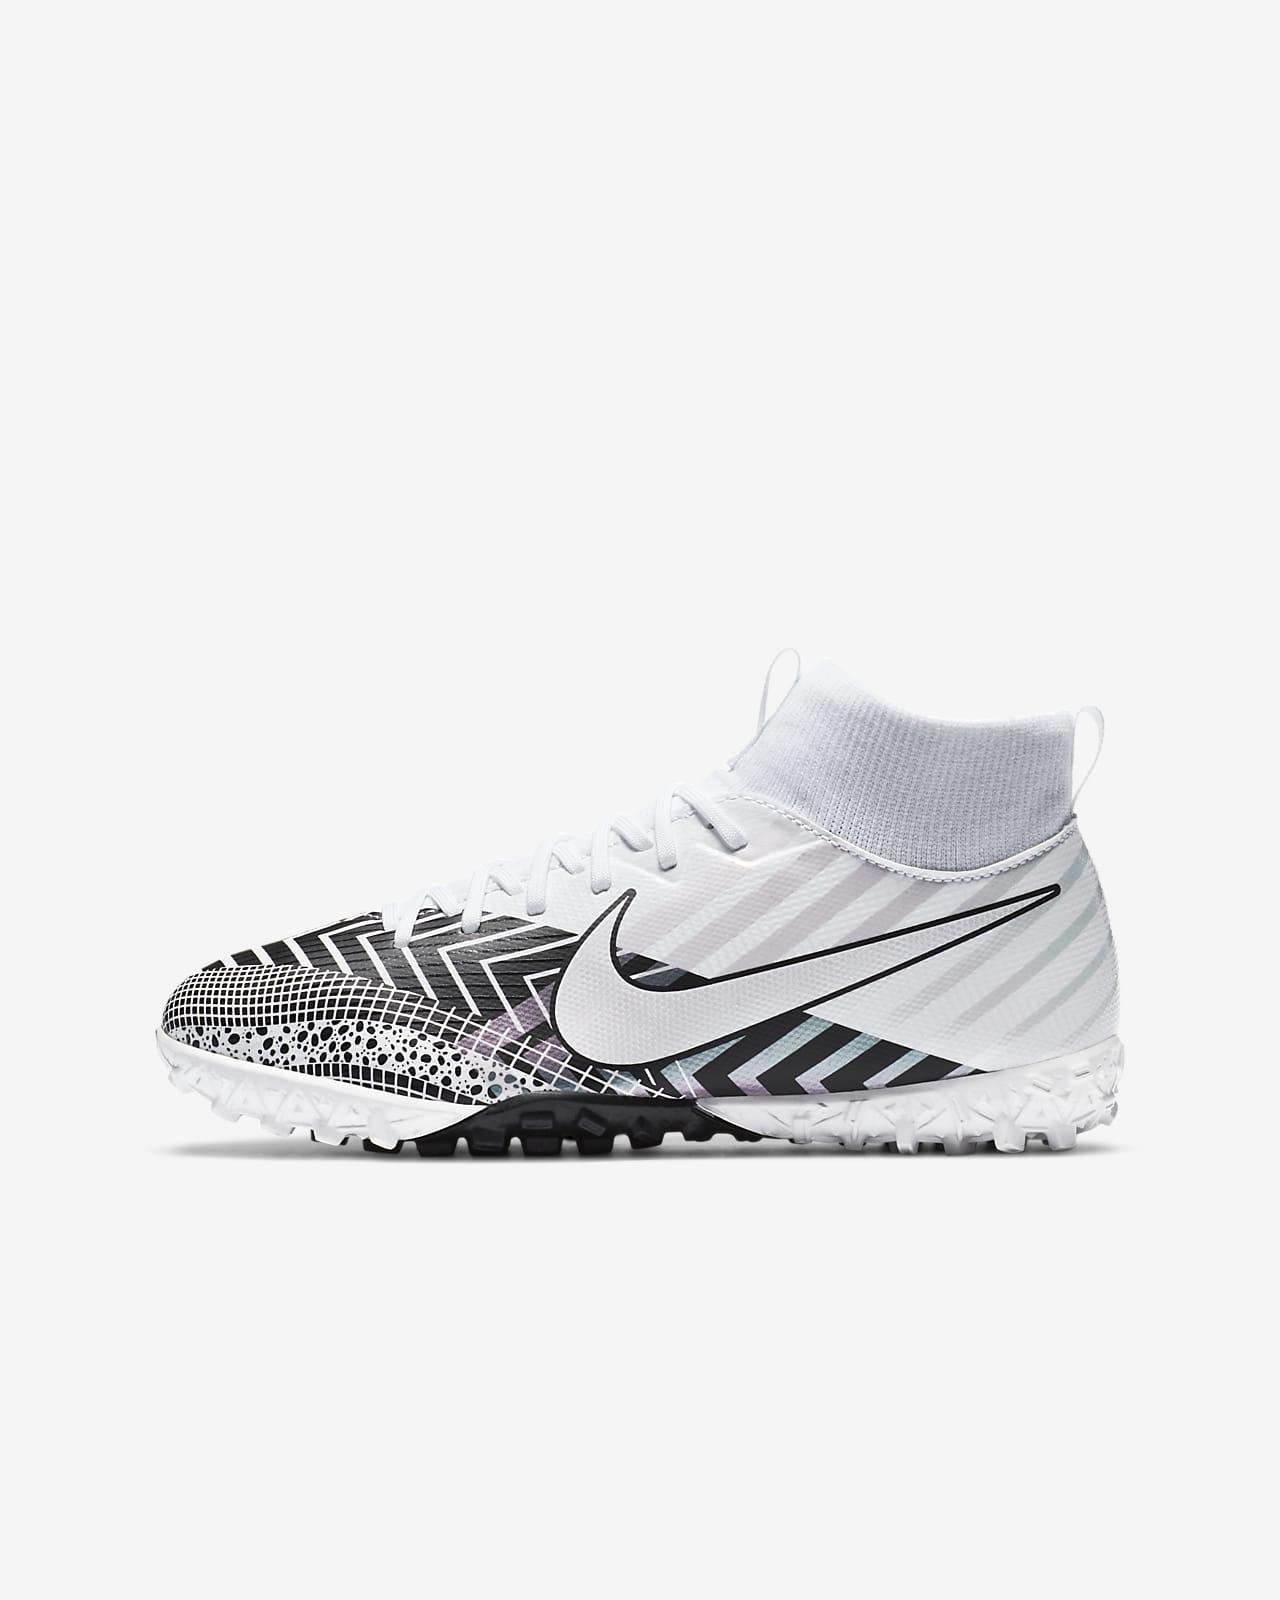 Scarpa da calcio per erba artificiale/sintetica Nike Jr. Mercurial Superfly 7 Academy MDS TF - Bambini/Ragazzi